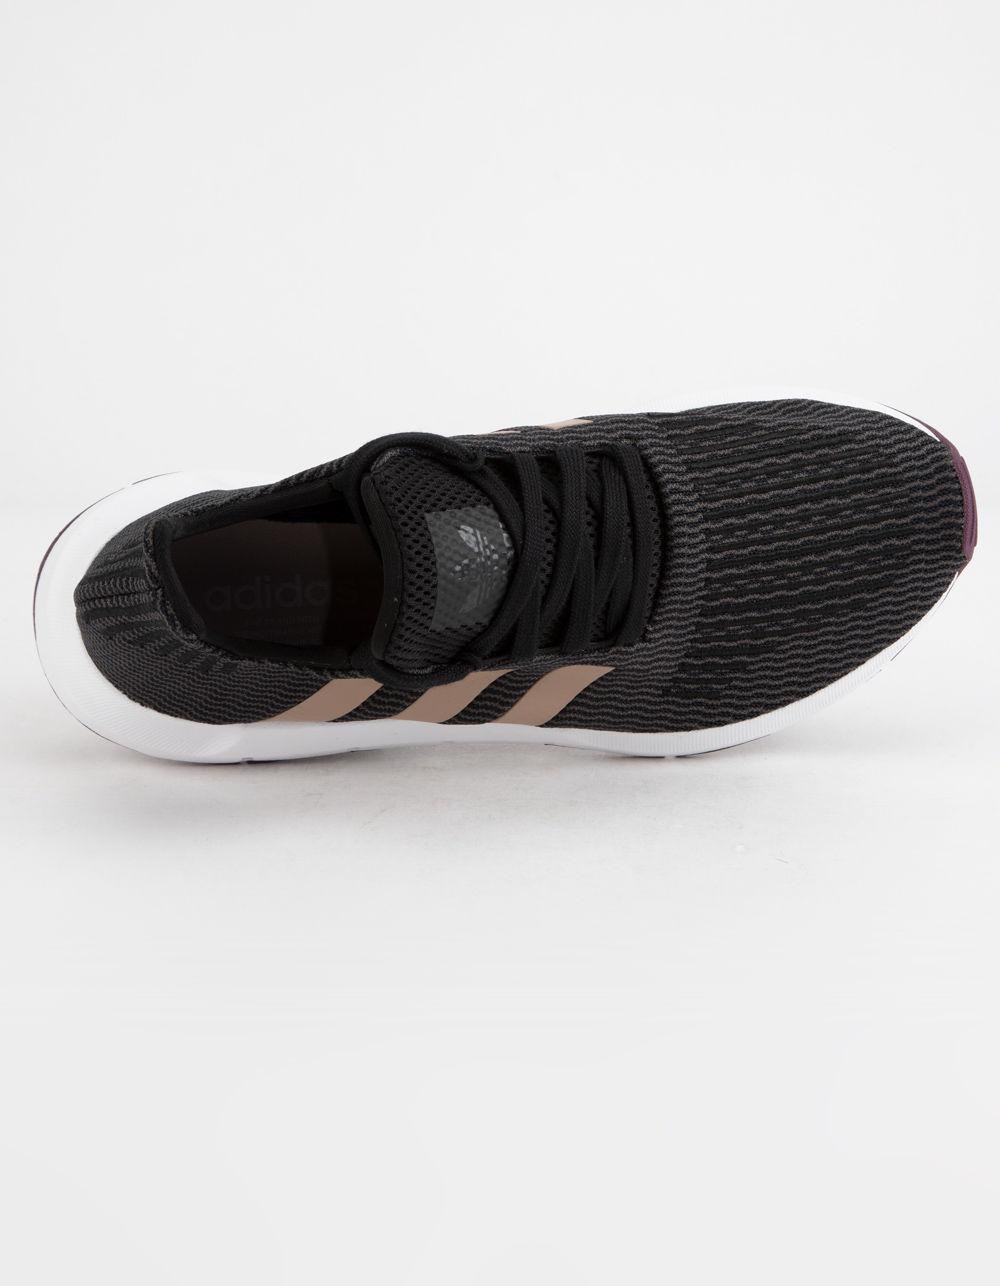 e3441df17ff7b Adidas - Swift Run Core Black   Ash Pearl Womens Shoes - Lyst. View  fullscreen